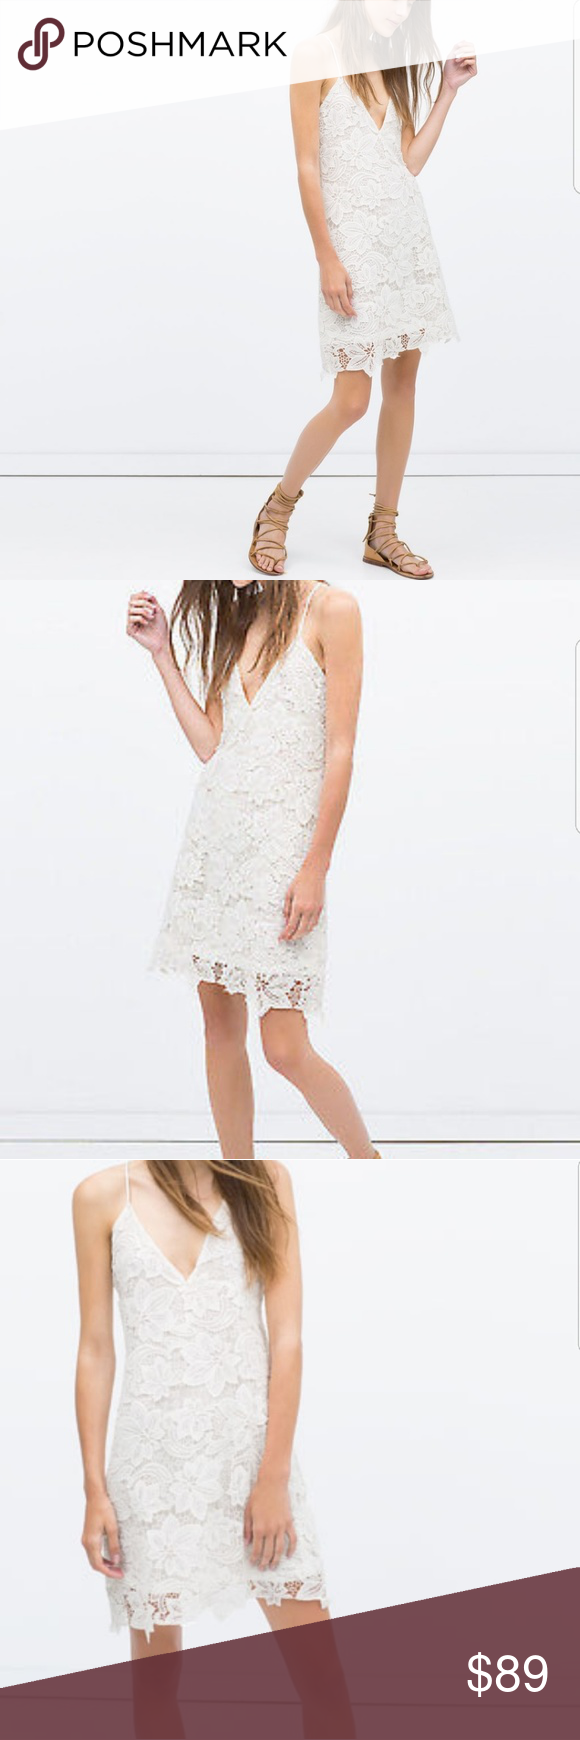 White lace dress zara  Zara lace dress Gorgeous lace zara dress with deep vcut nwt